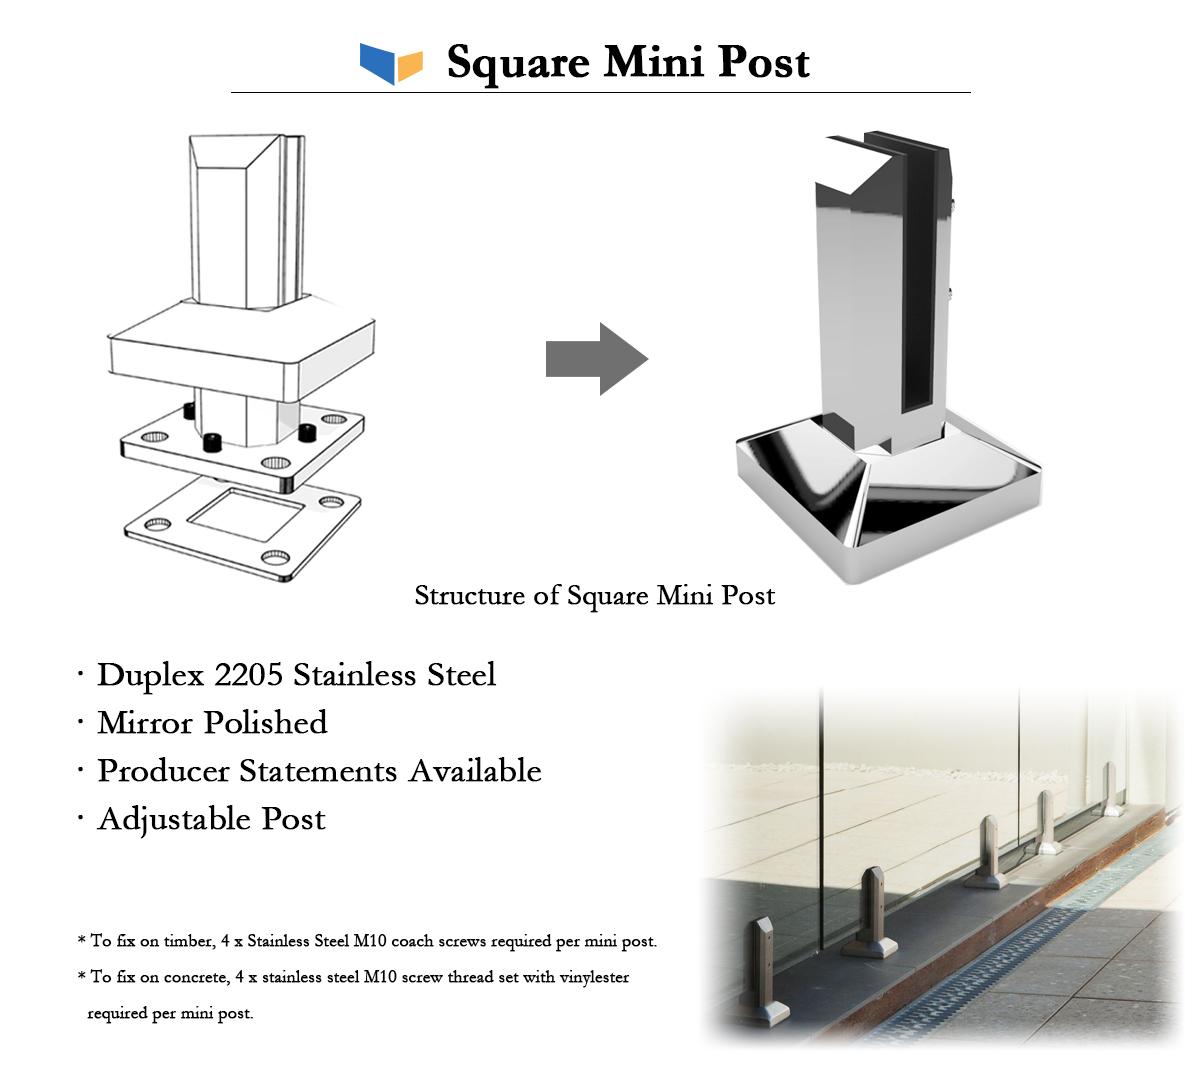 squareminipost-revised.jpg